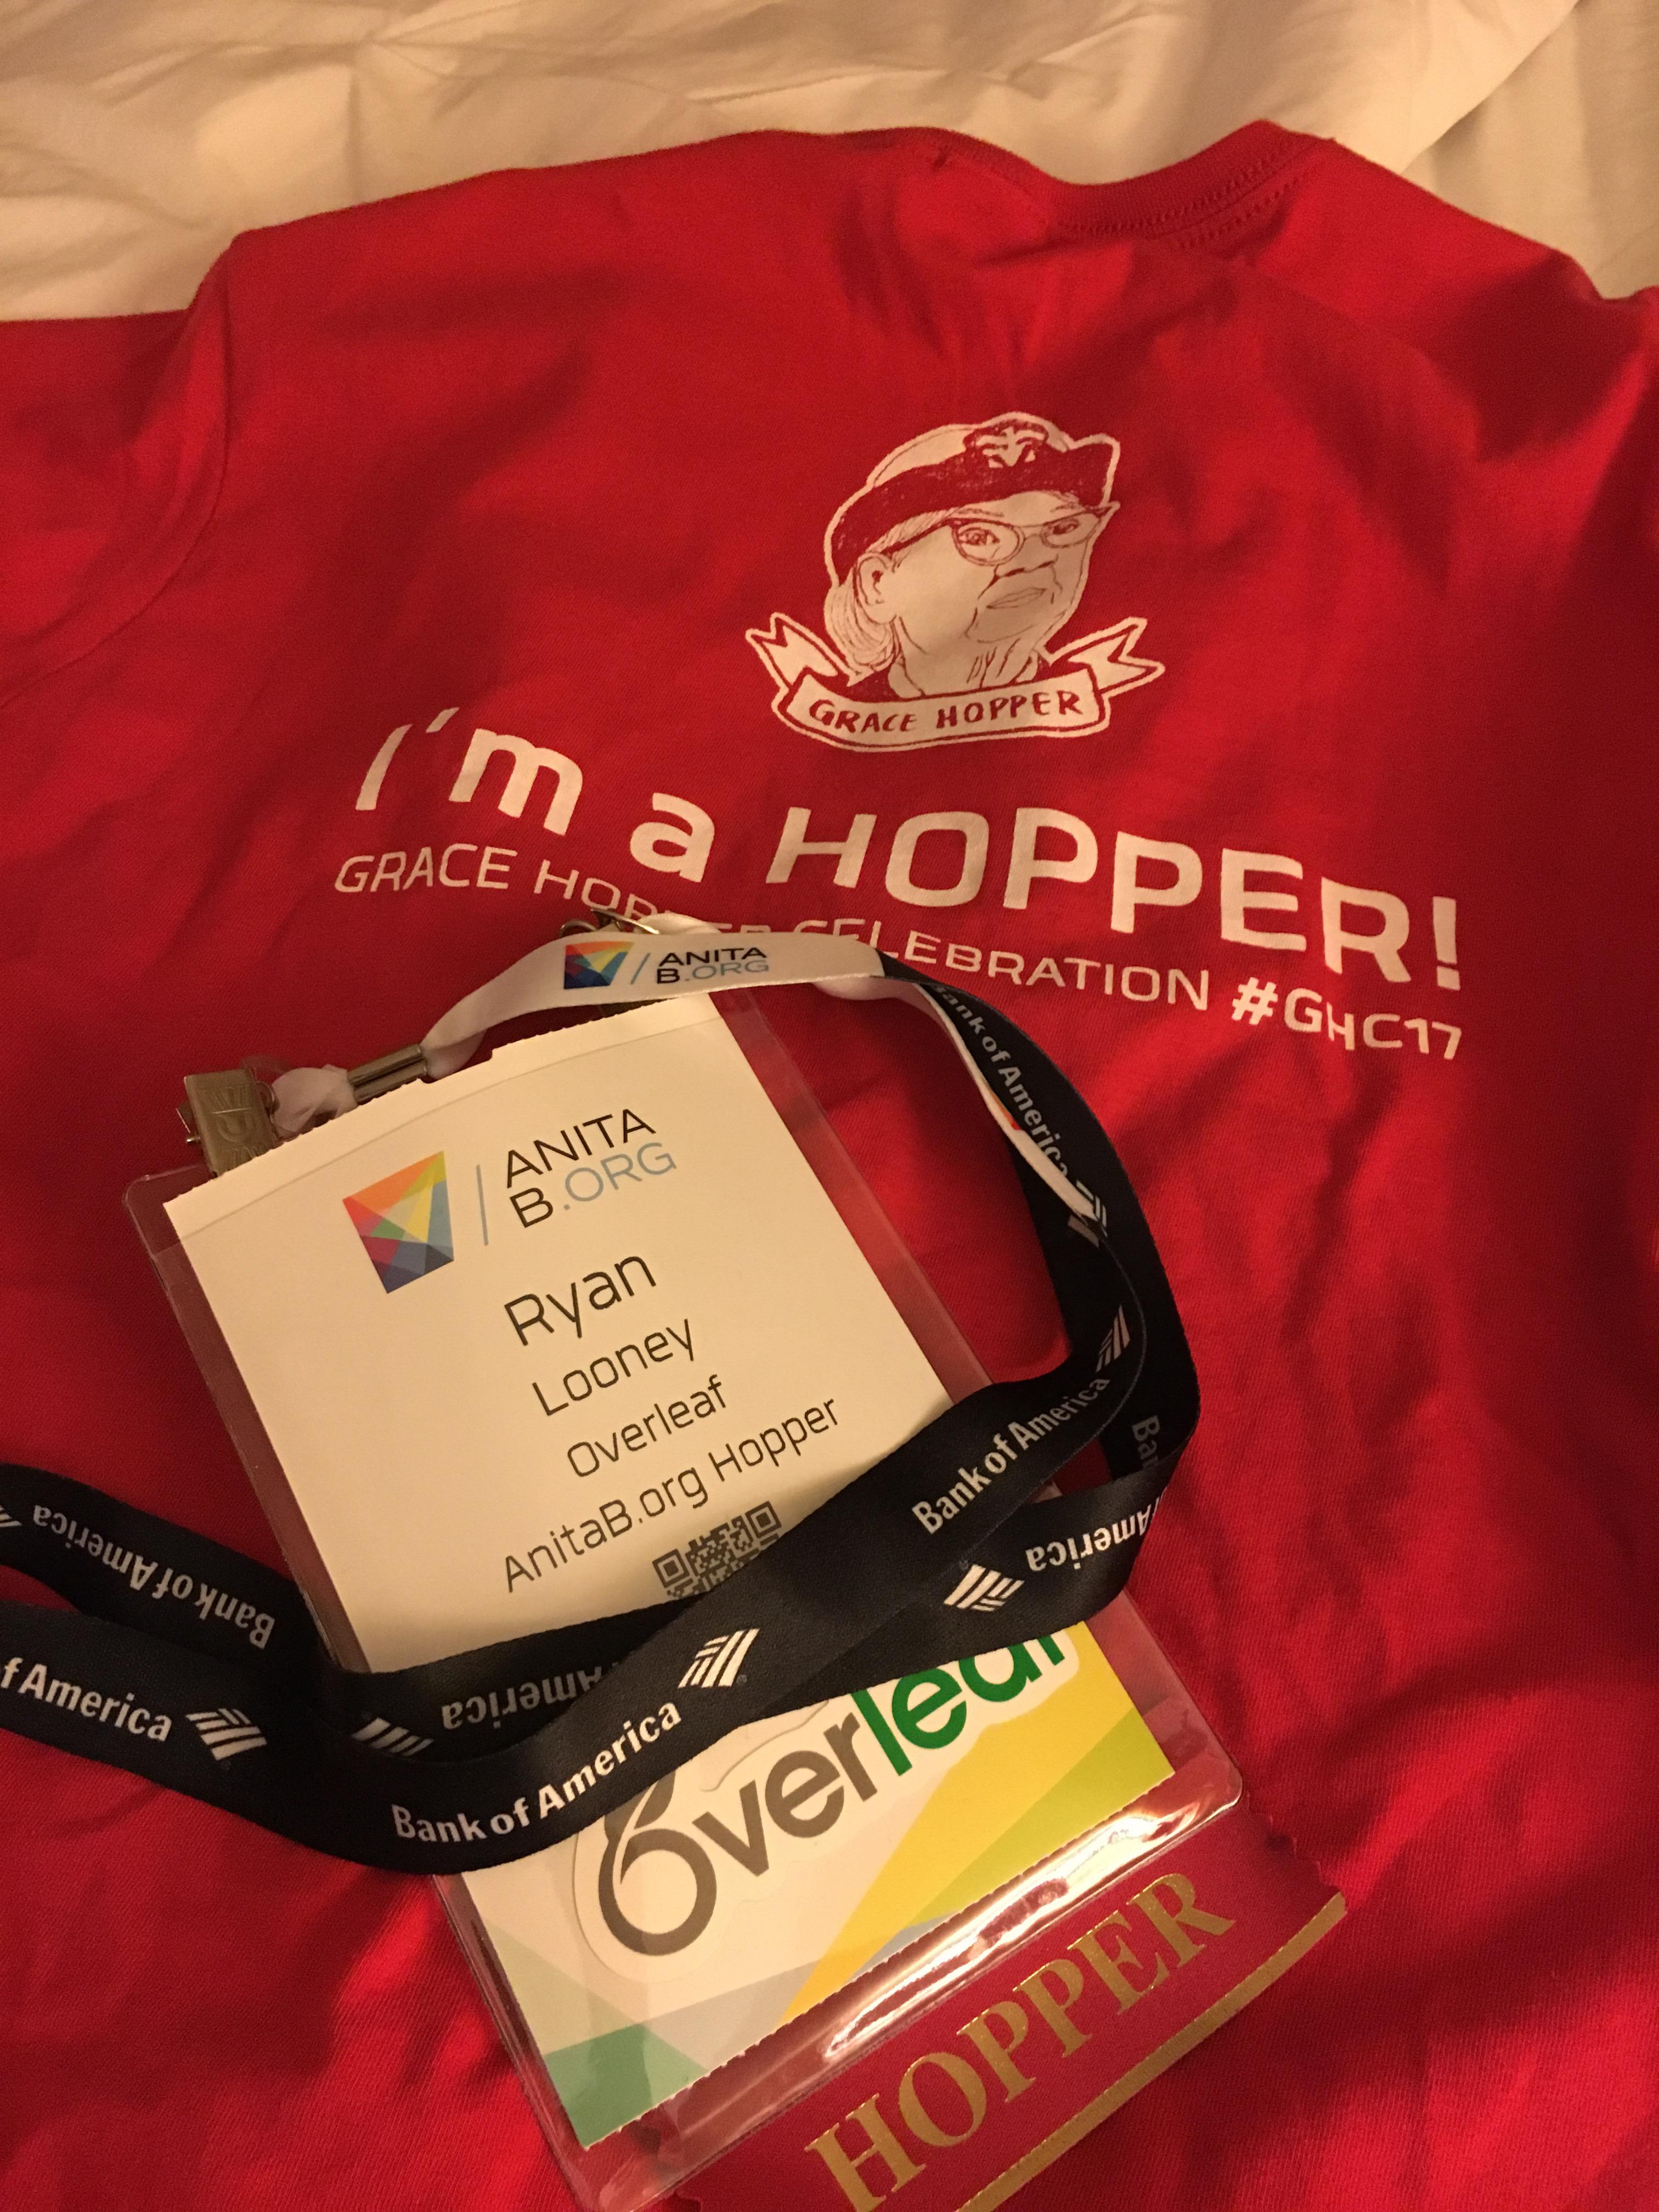 Hopper T shirt and name badge